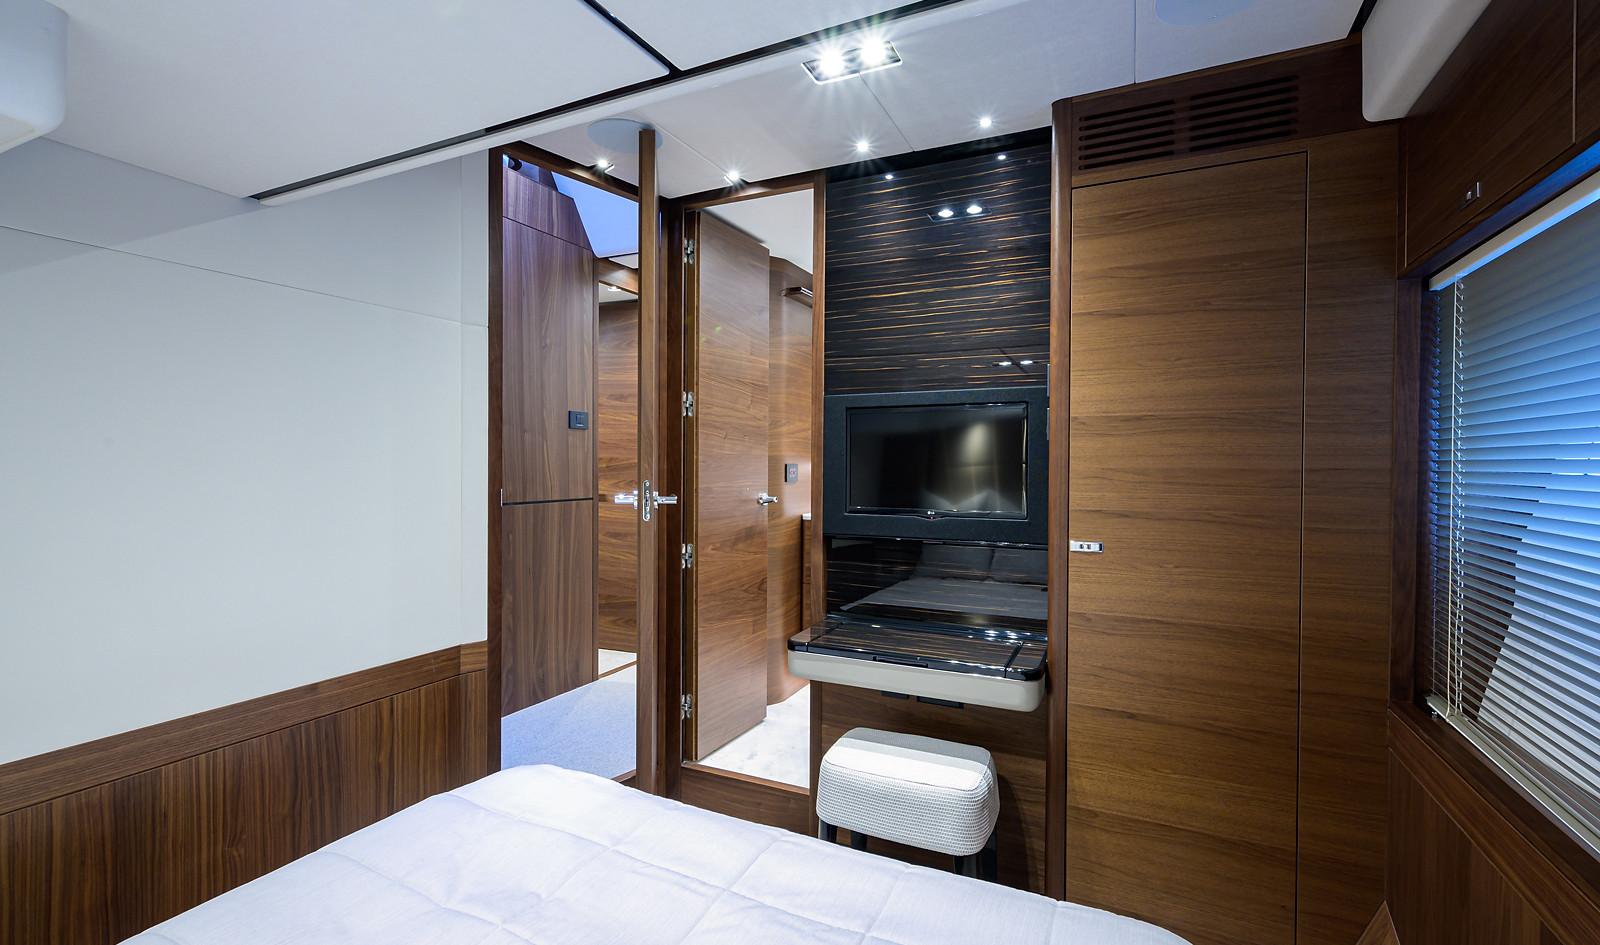 Y78-079_starboard_guest_stateroom_3.jpg